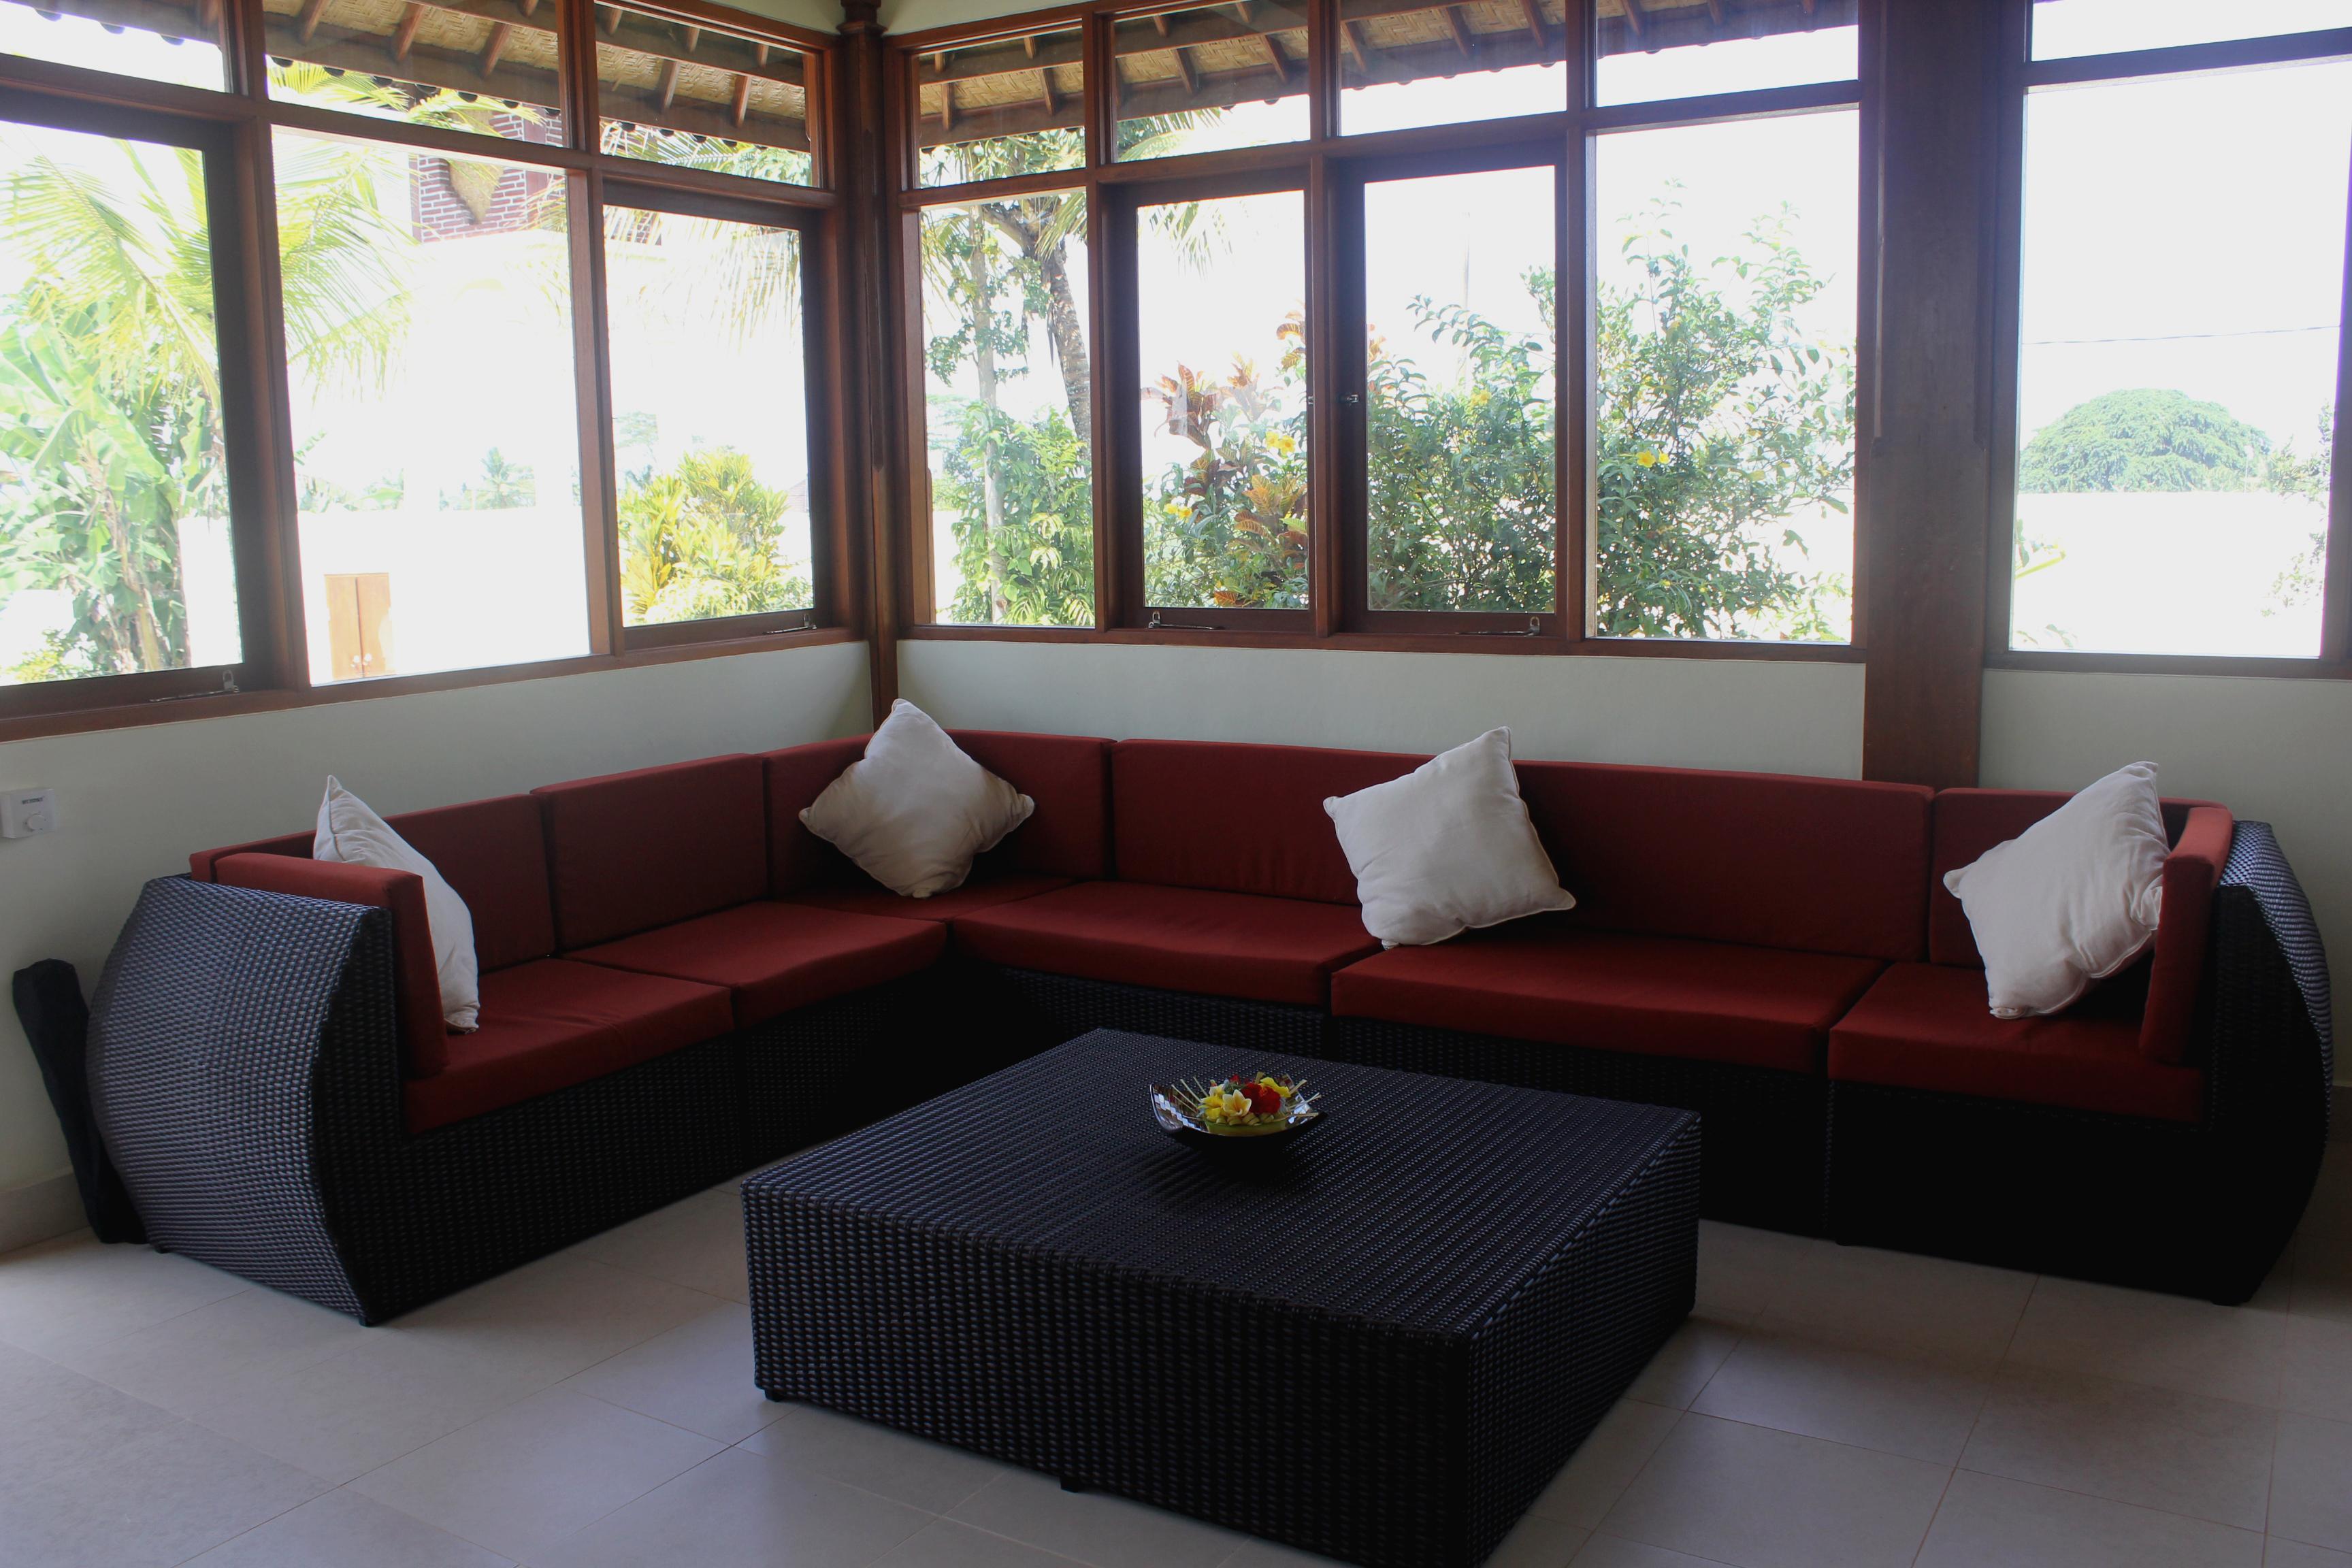 Lounge in Sun room